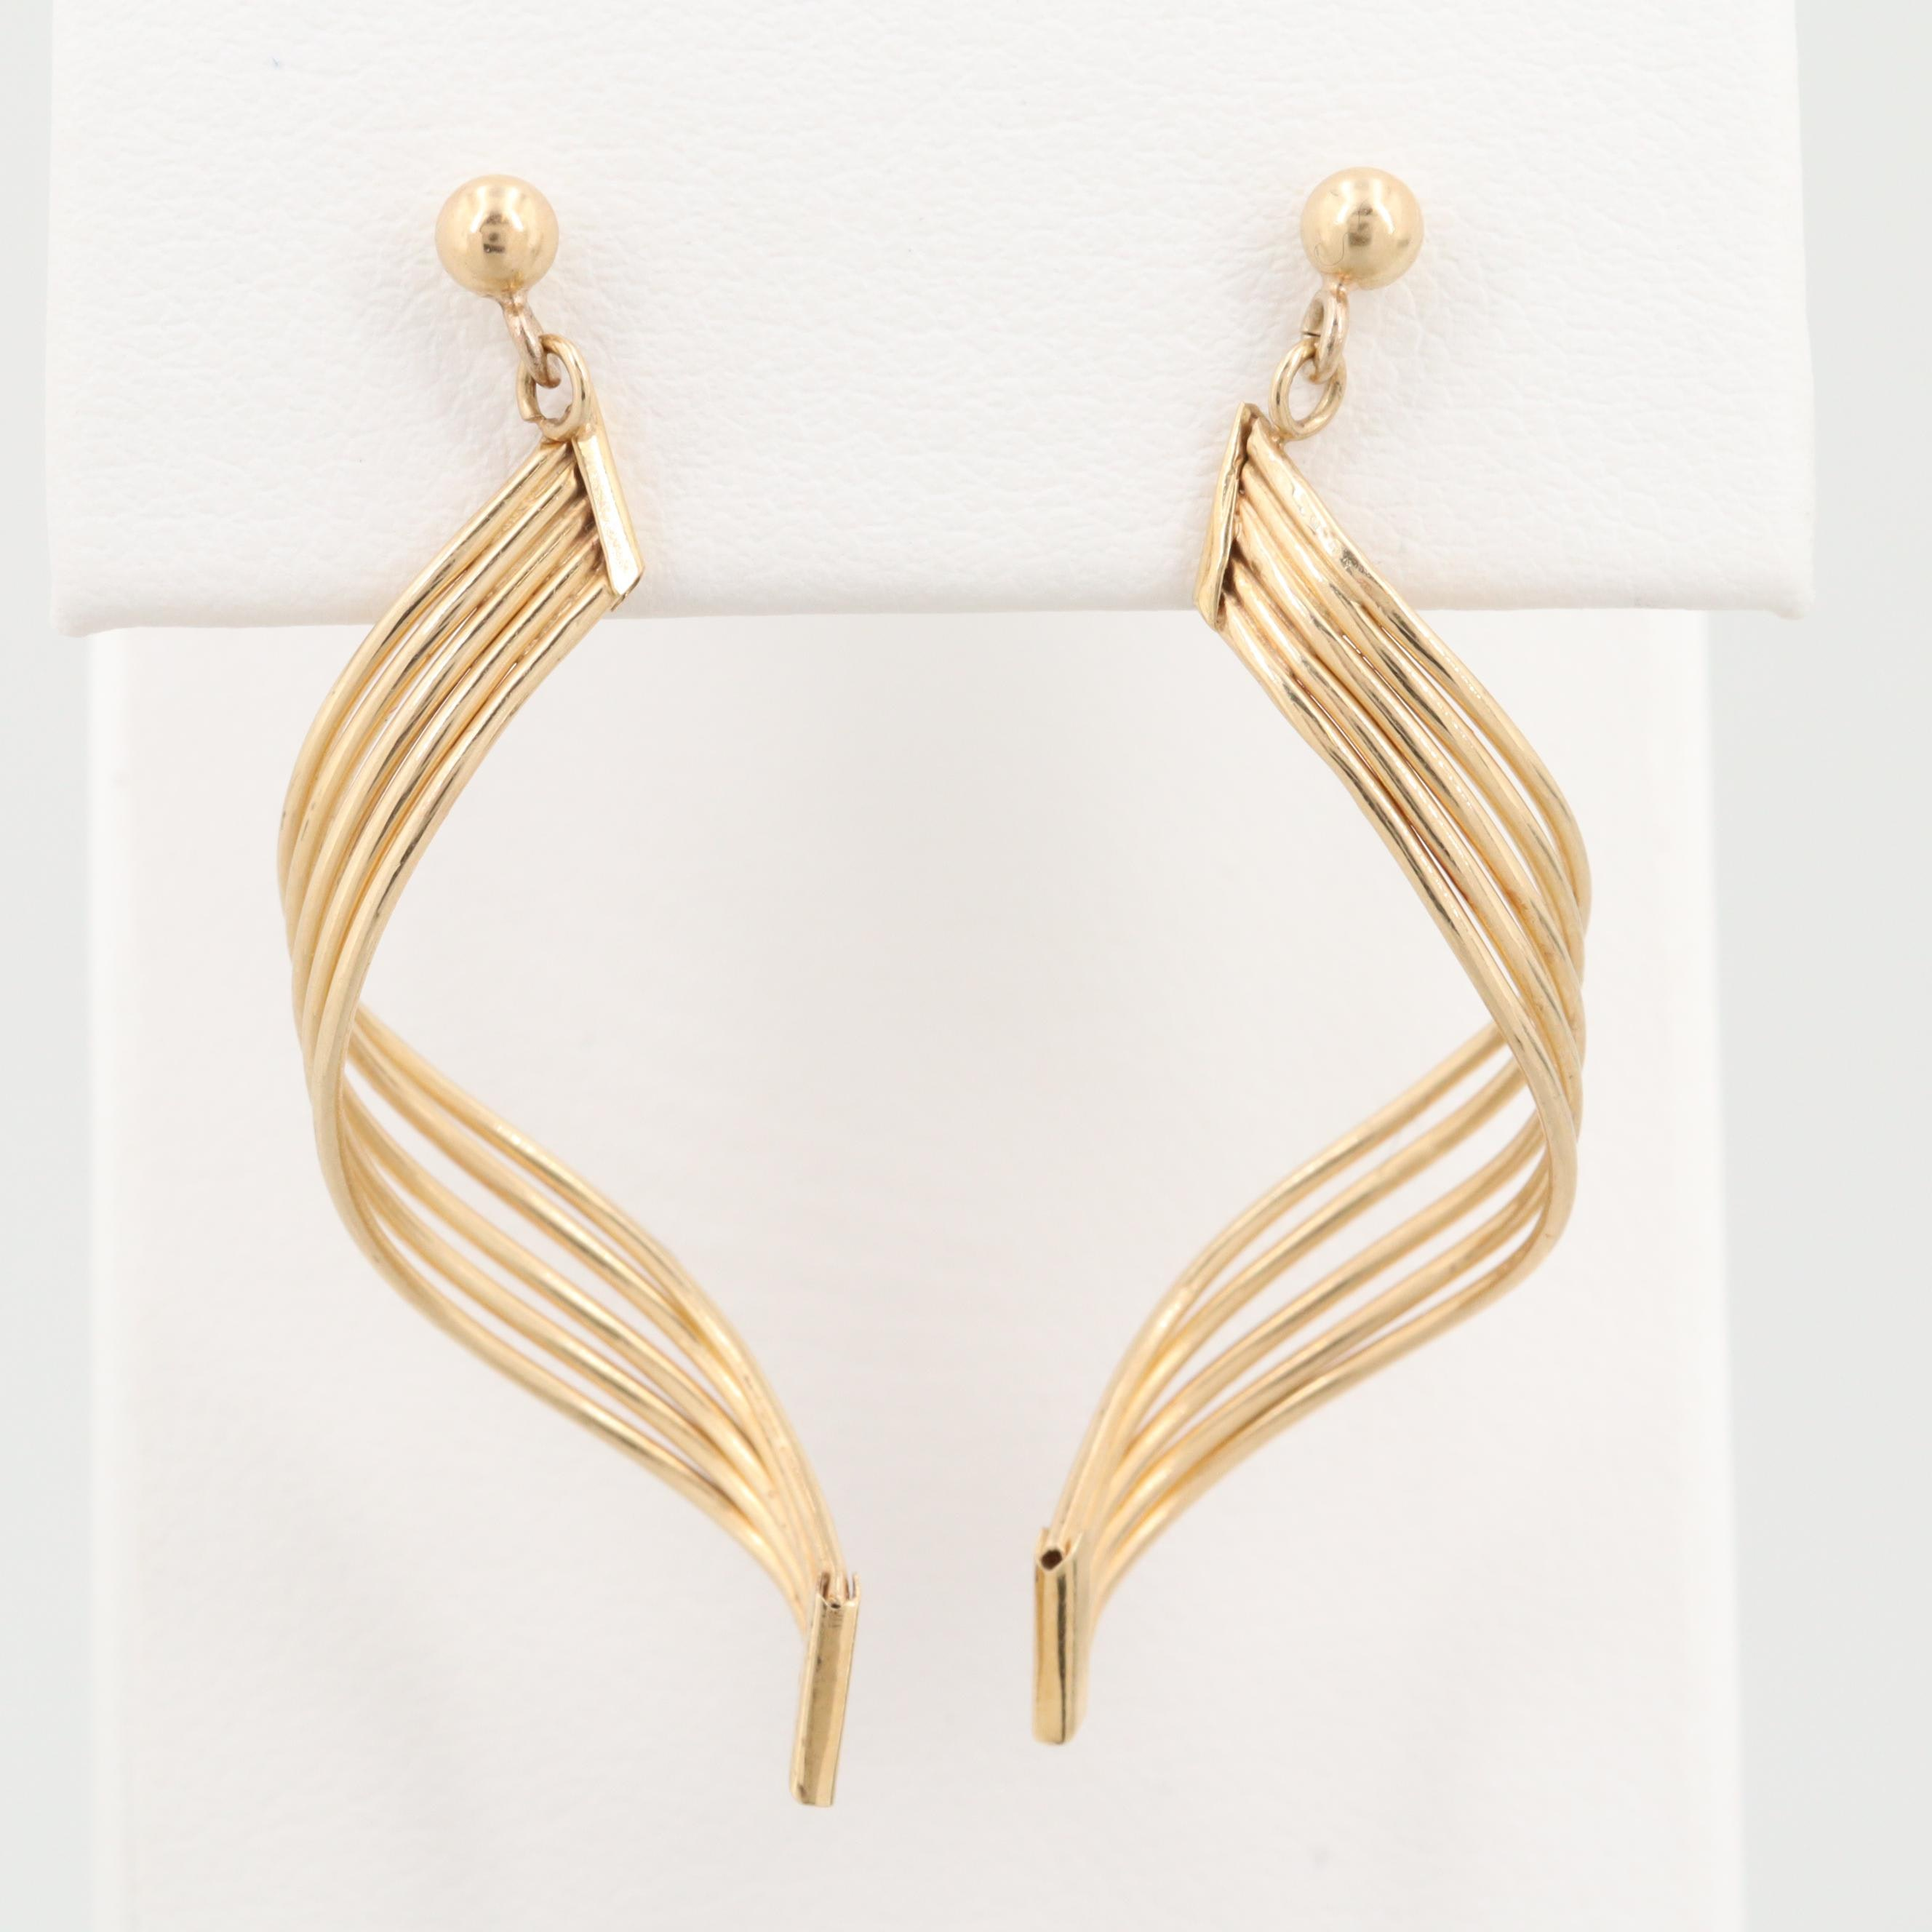 14K Yellow Gold Twisted Dangle Earrings